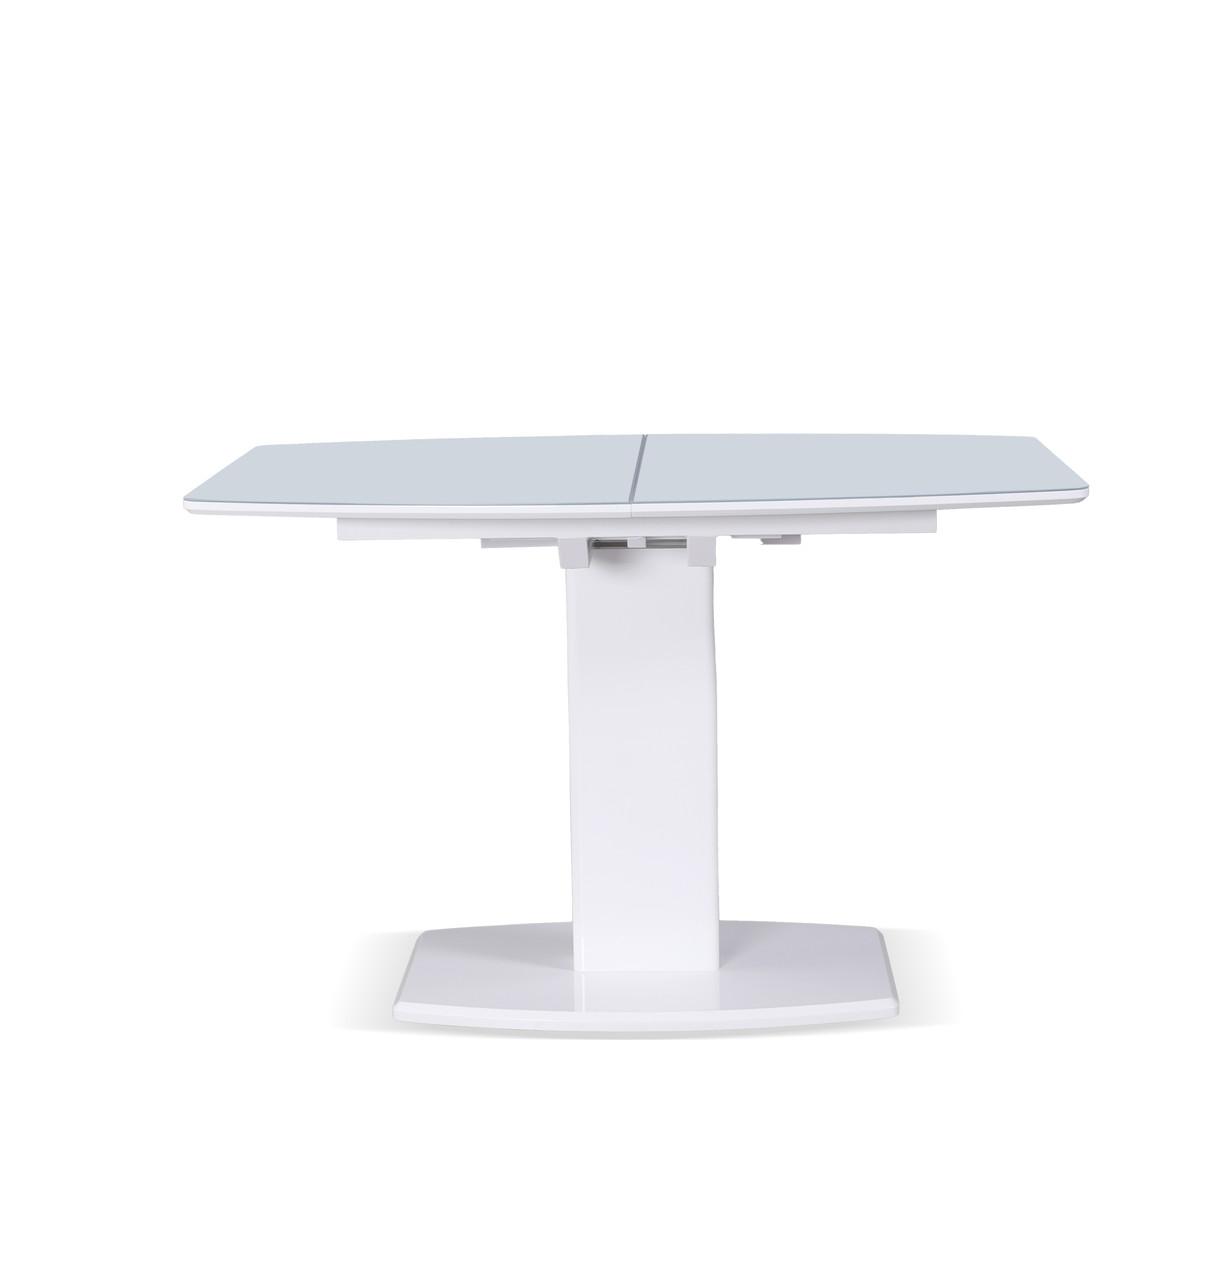 Стол обеденный (глянец) Милан-1 TES Mobili